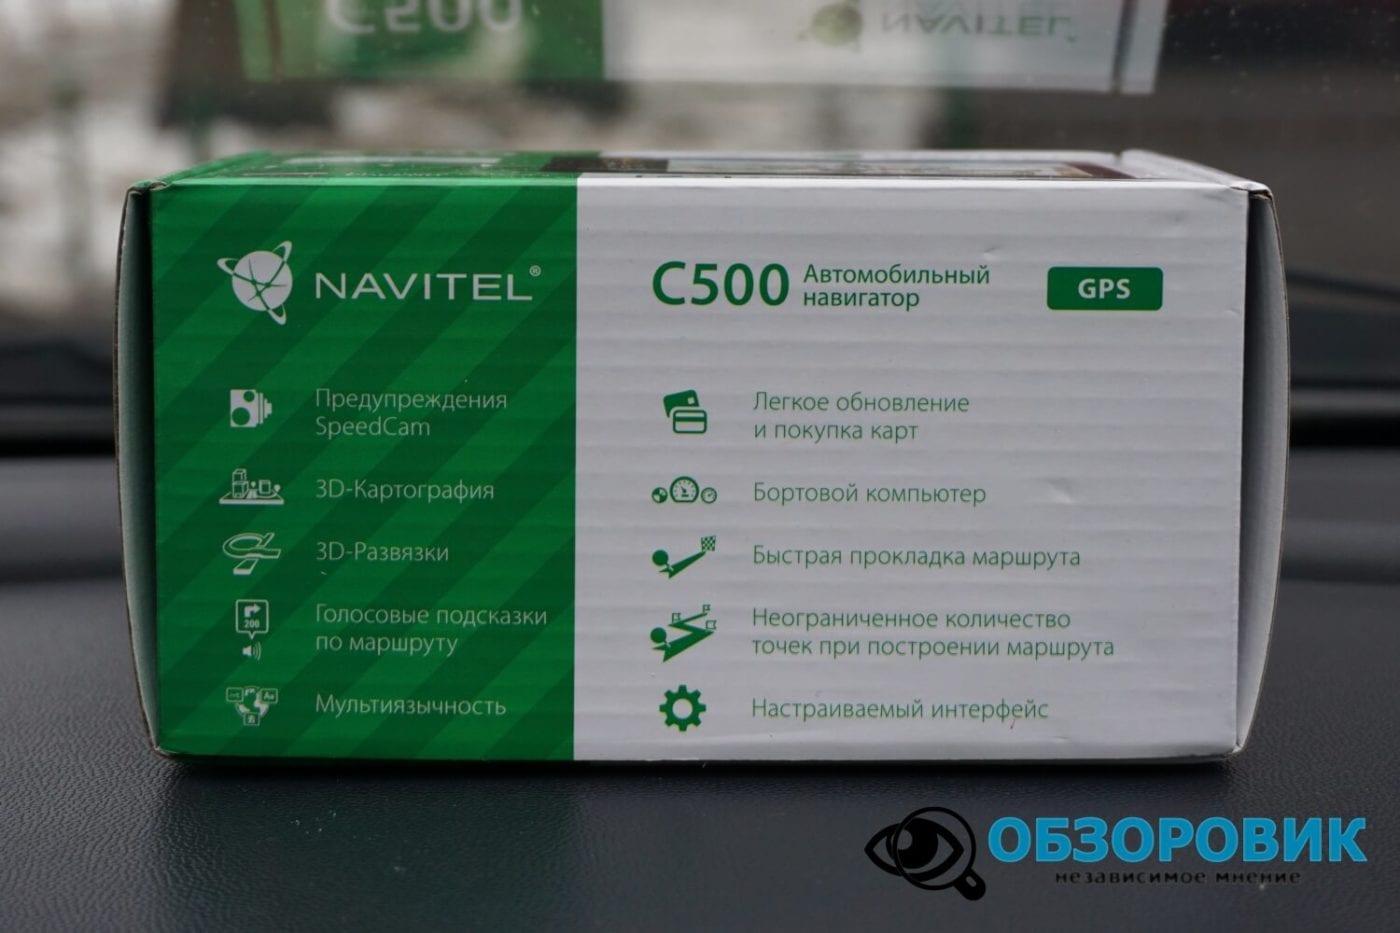 Обзор навигагора NAVITEL C500 2